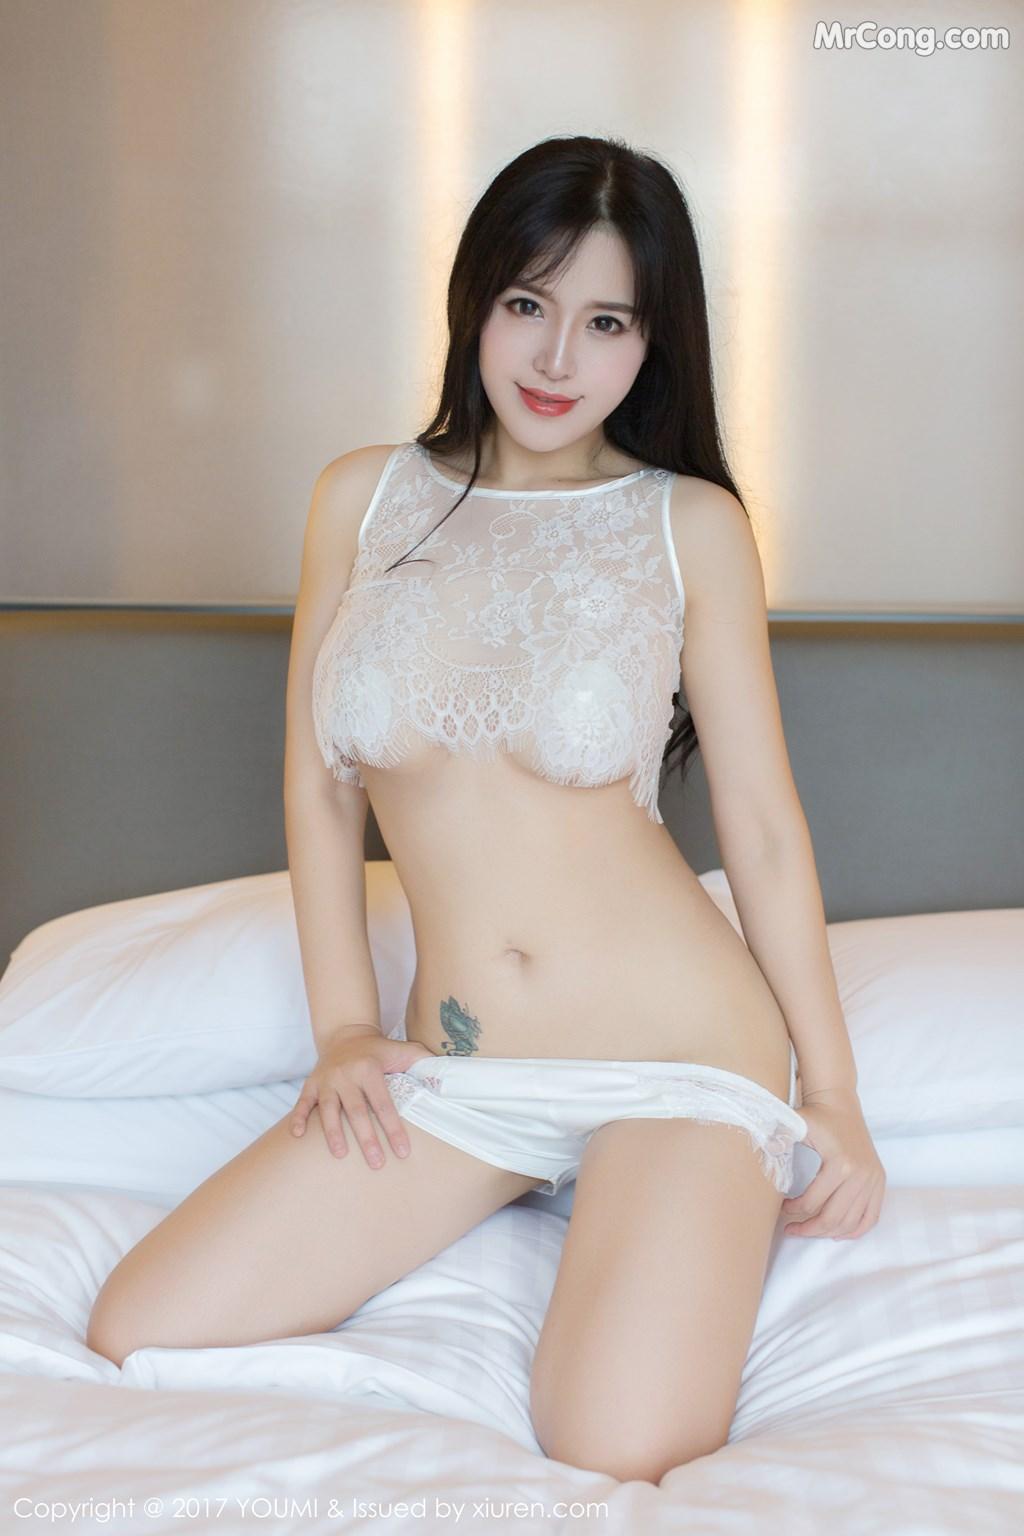 YouMi Vol.121: Model Liu Yu Er (刘 钰 儿) (51 photos)